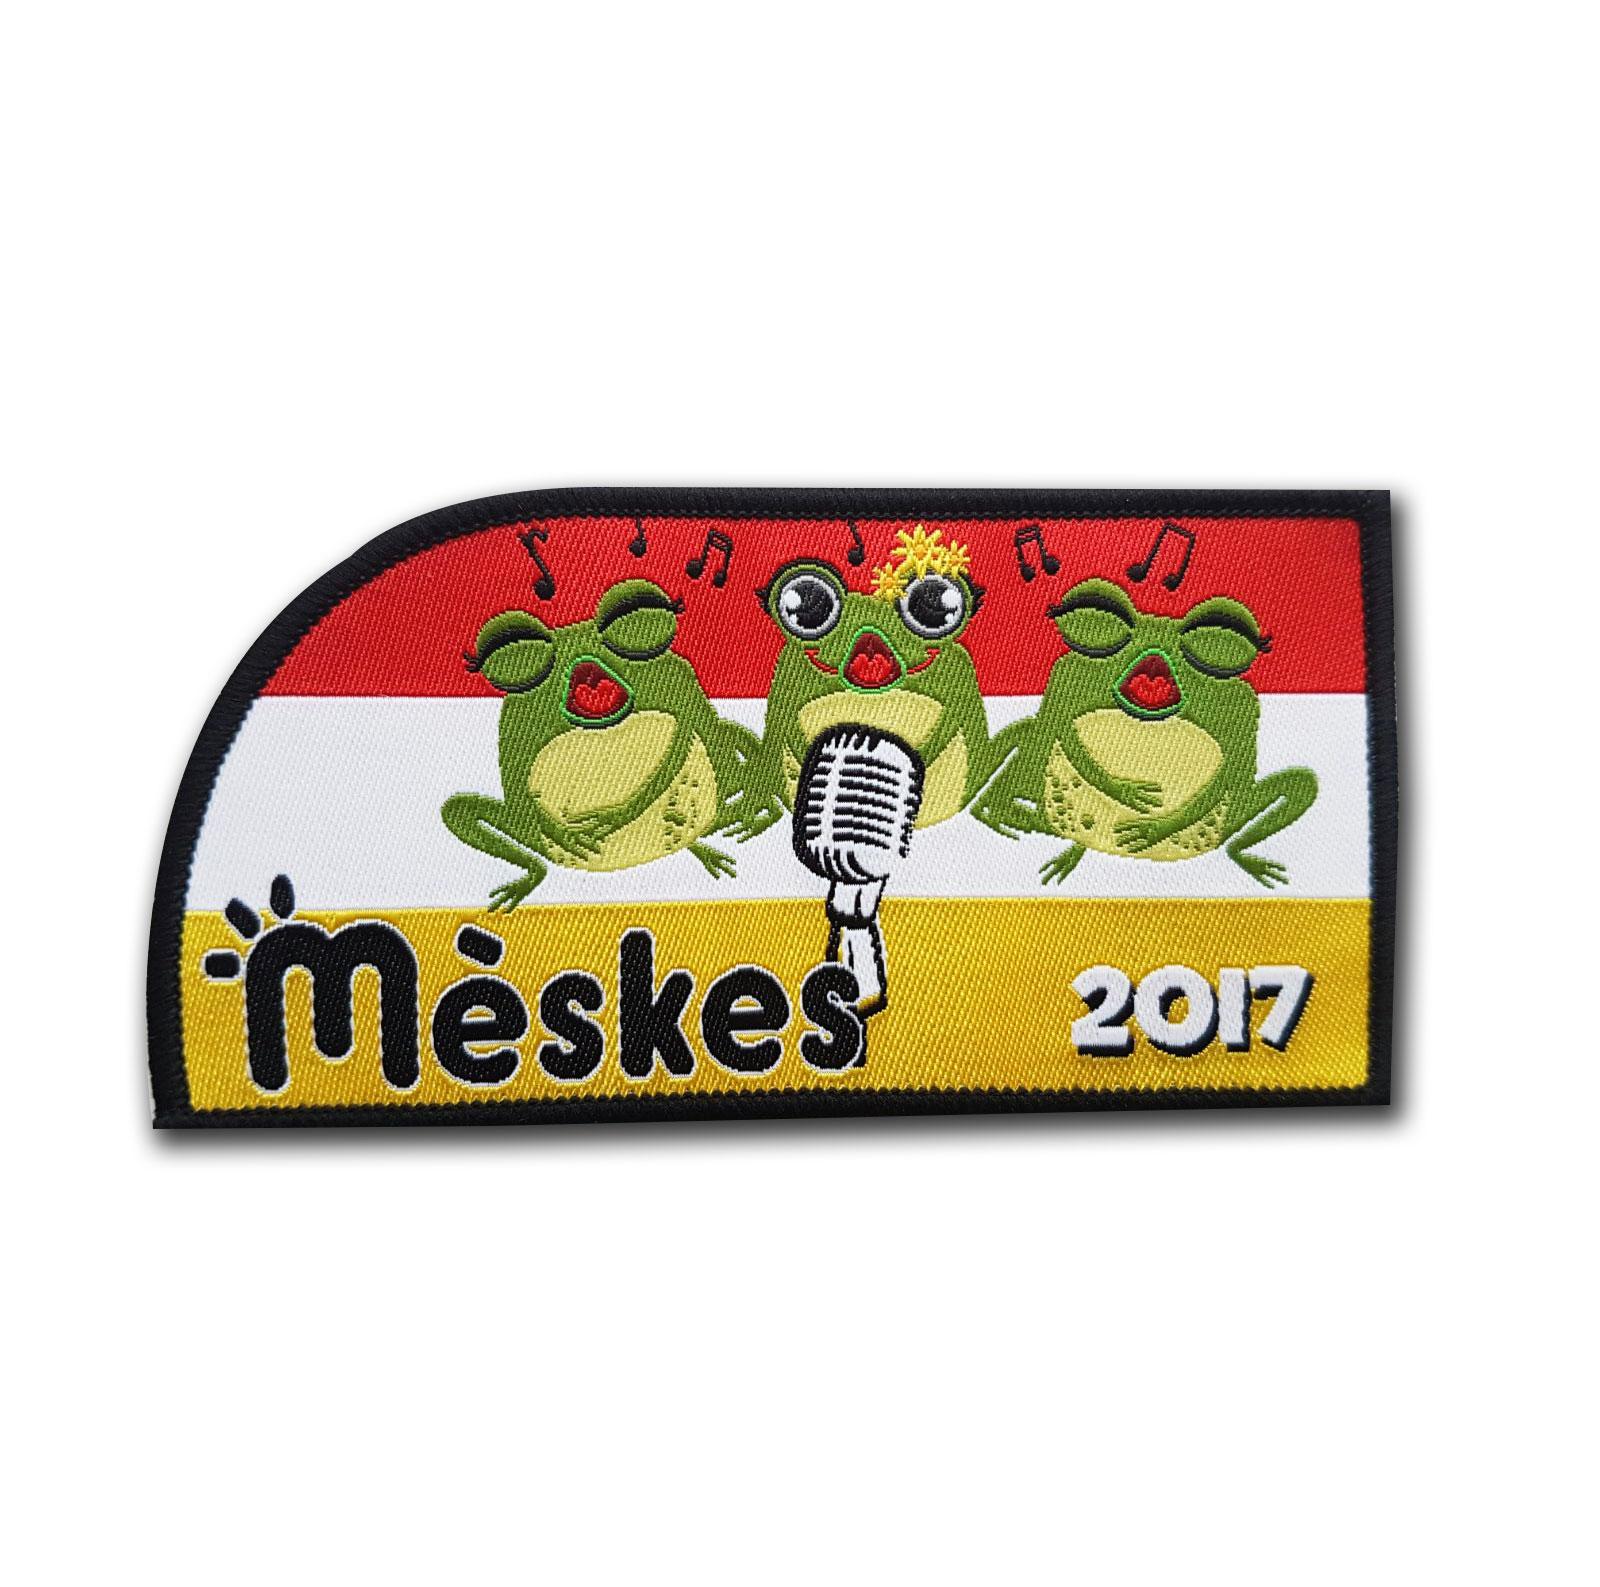 Mèskes jaarembleem 2017